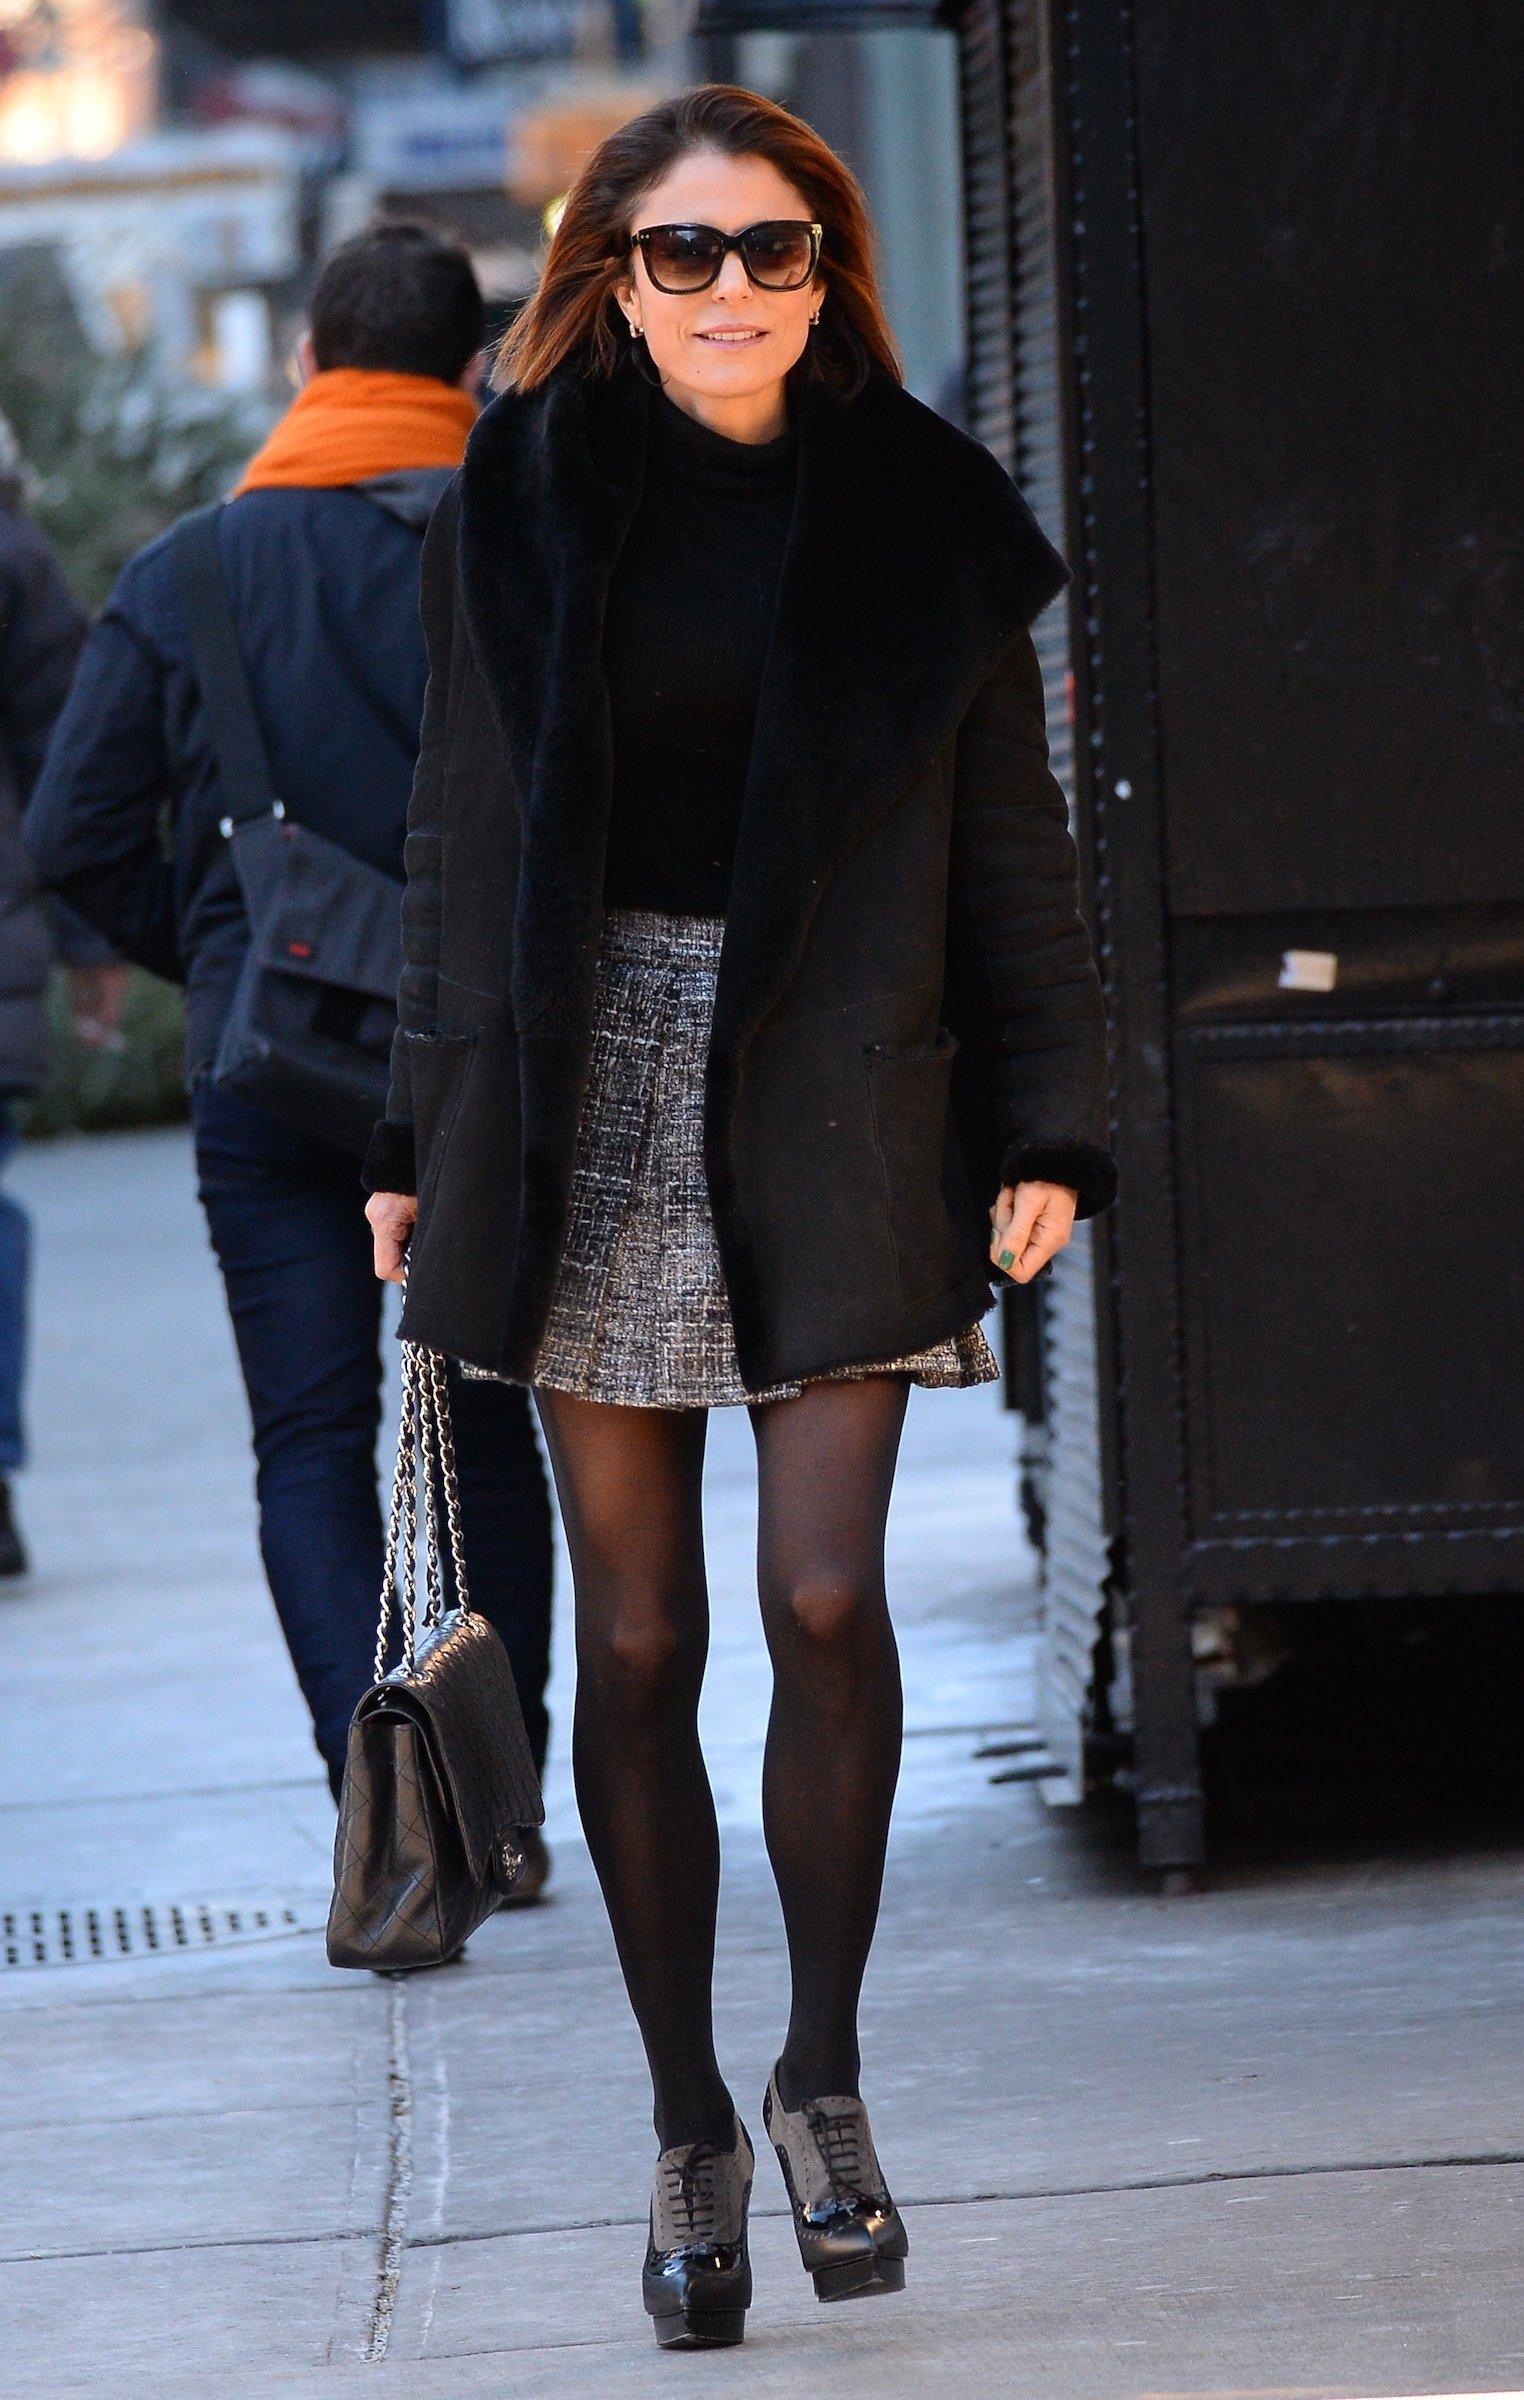 Bethenny Frankel is seen walking in Soho on January 6, 2016 in New York City